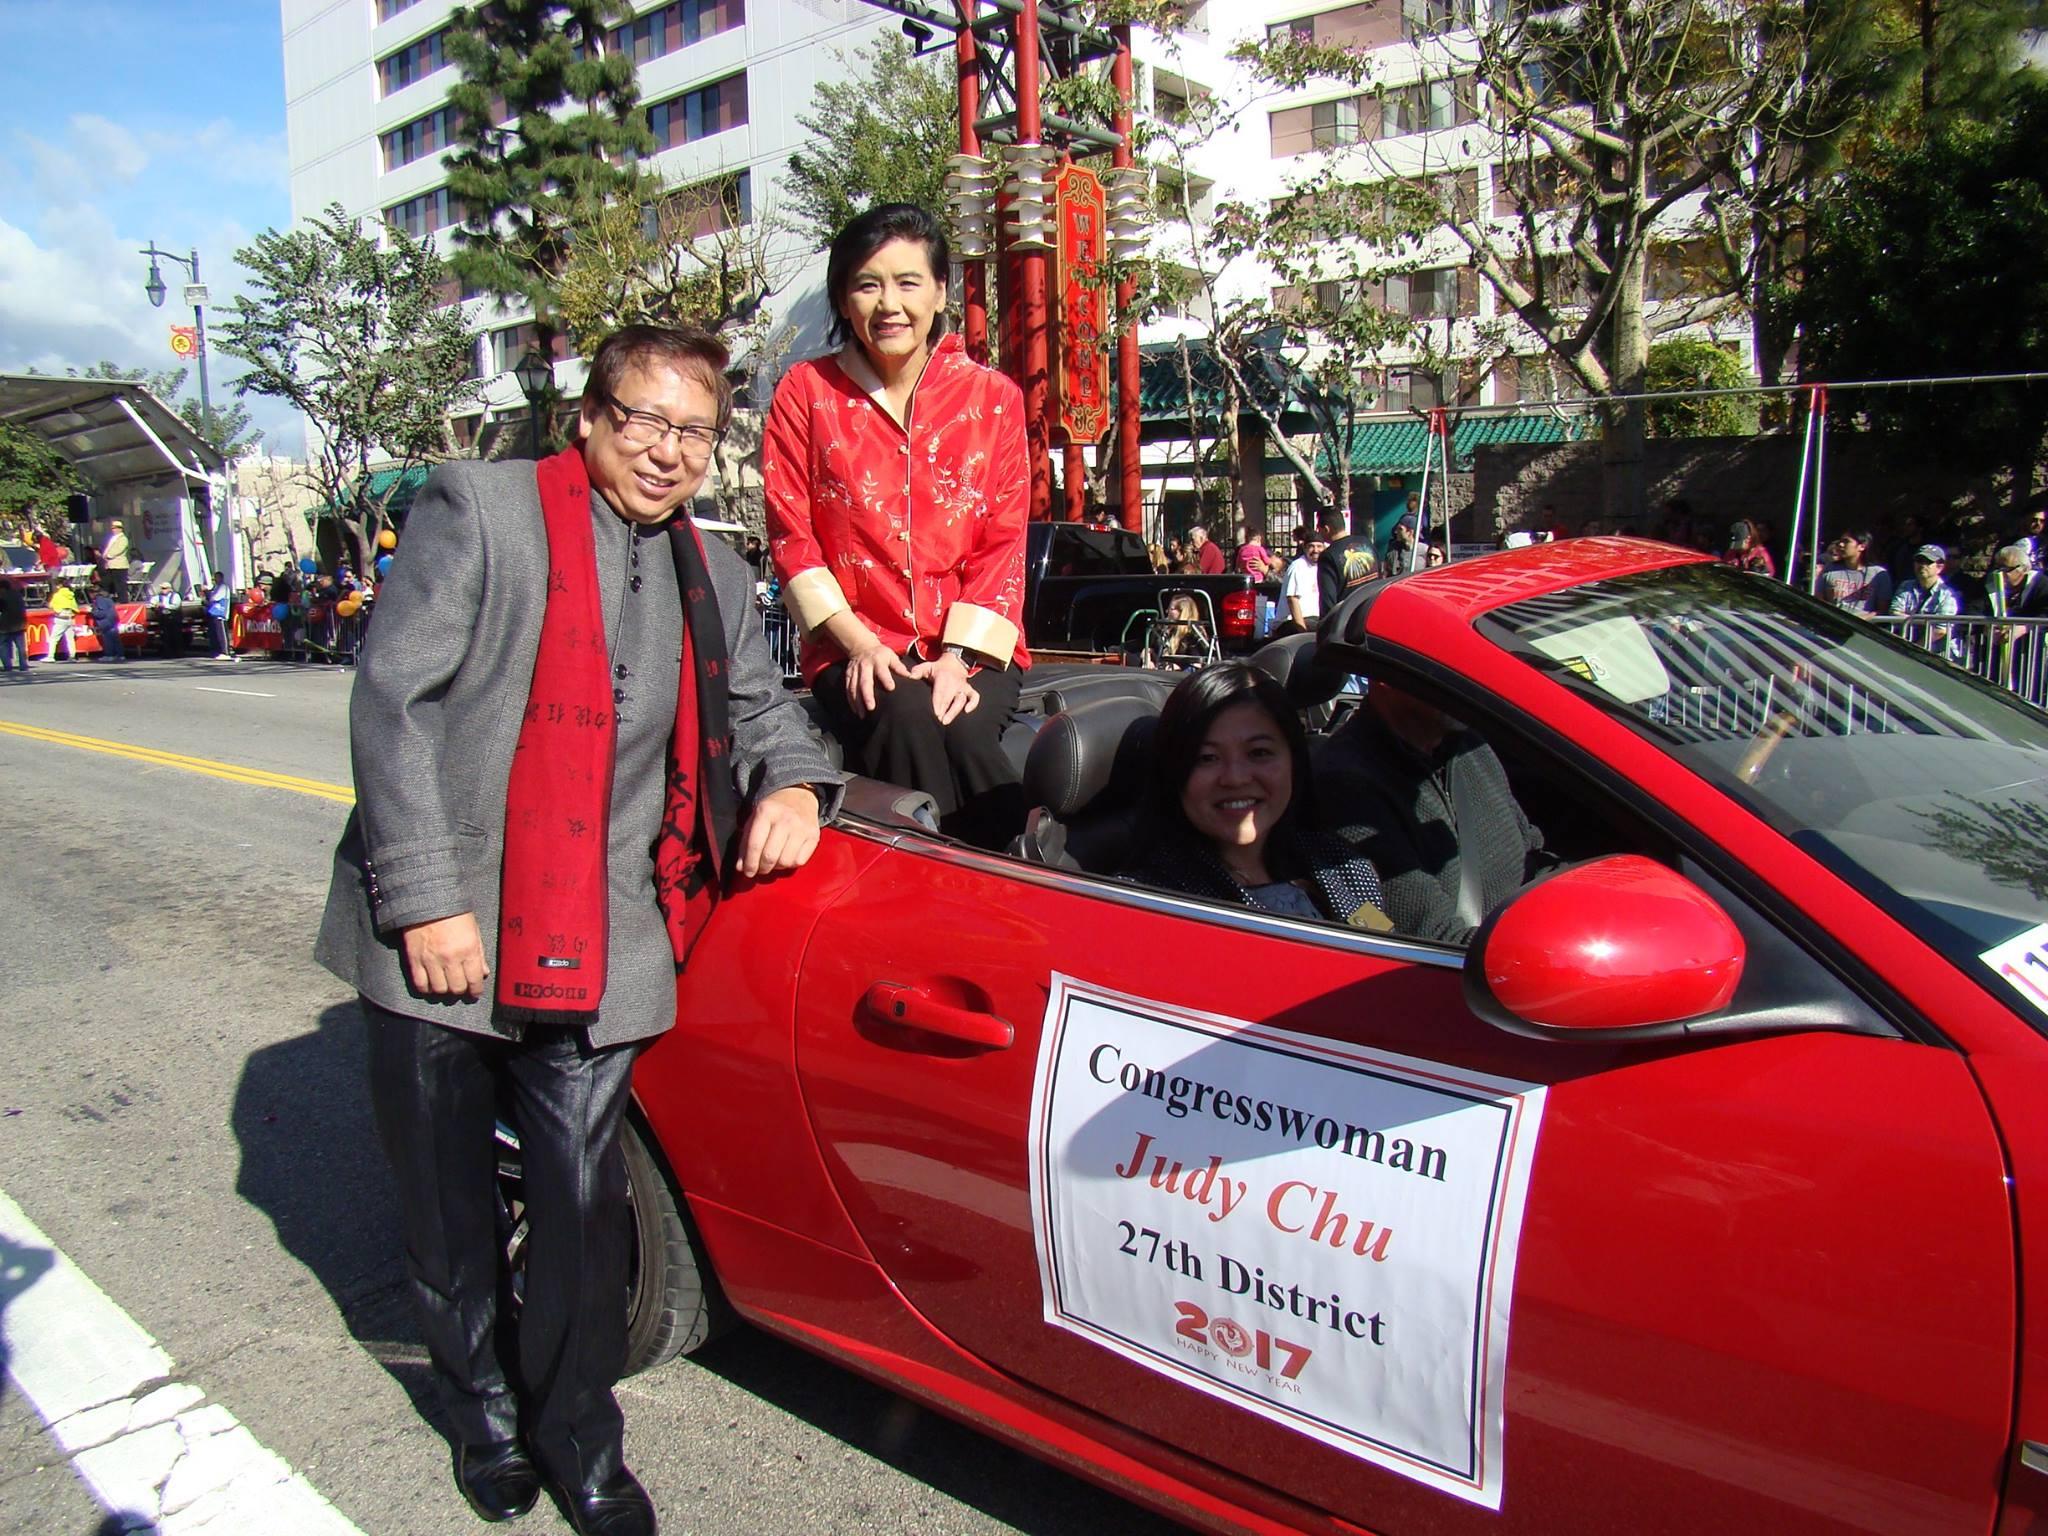 Hon. Judy Chu, U.S. Congressmember, 27th District.jpg